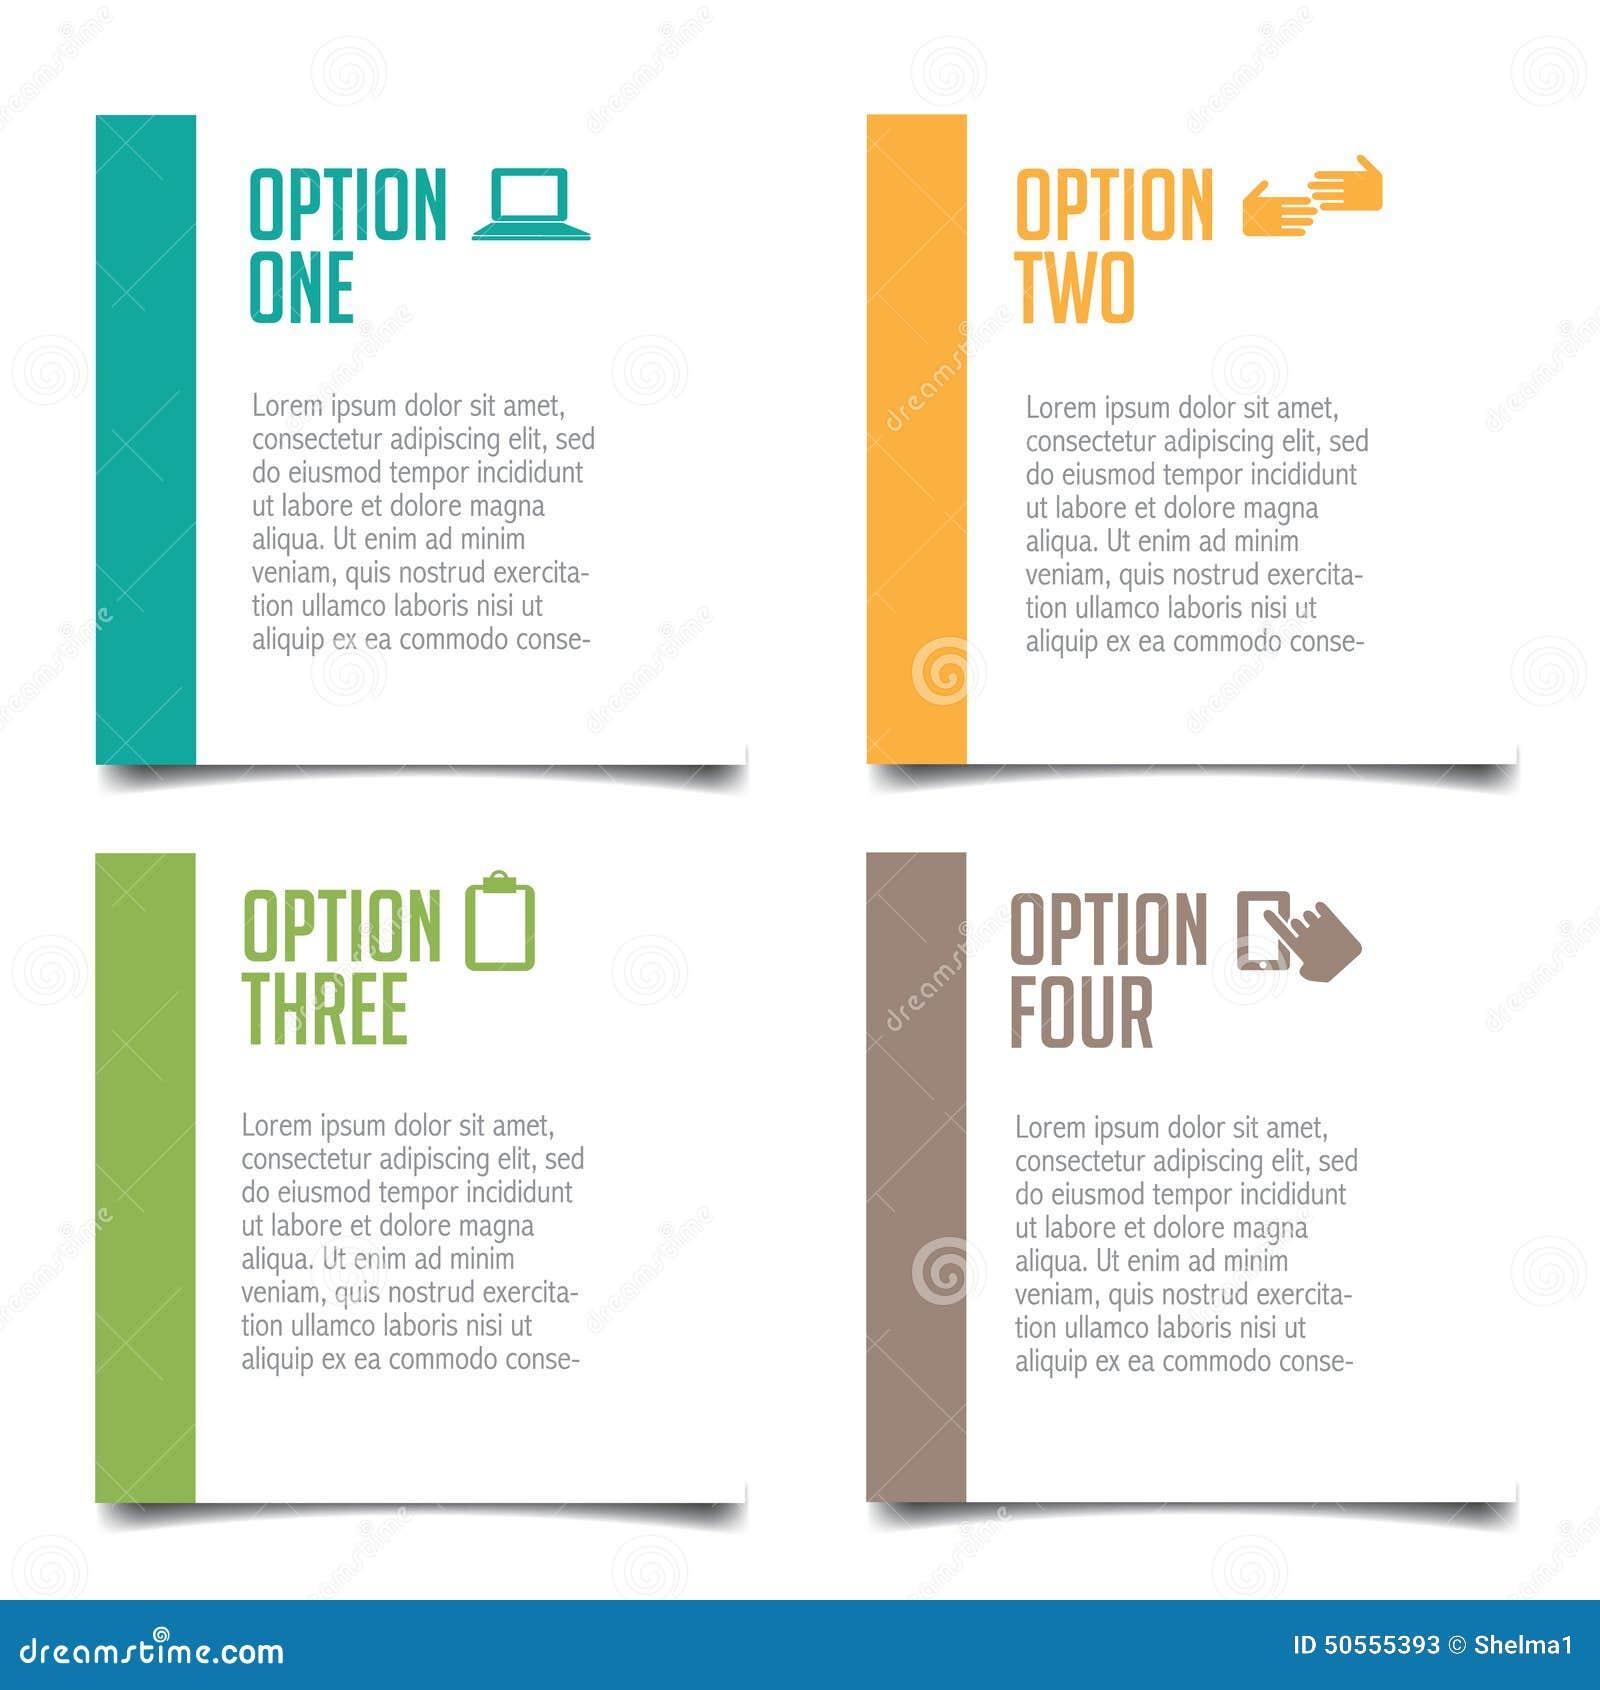 Poster design article - Poster Design Article Four Options Infographic Design